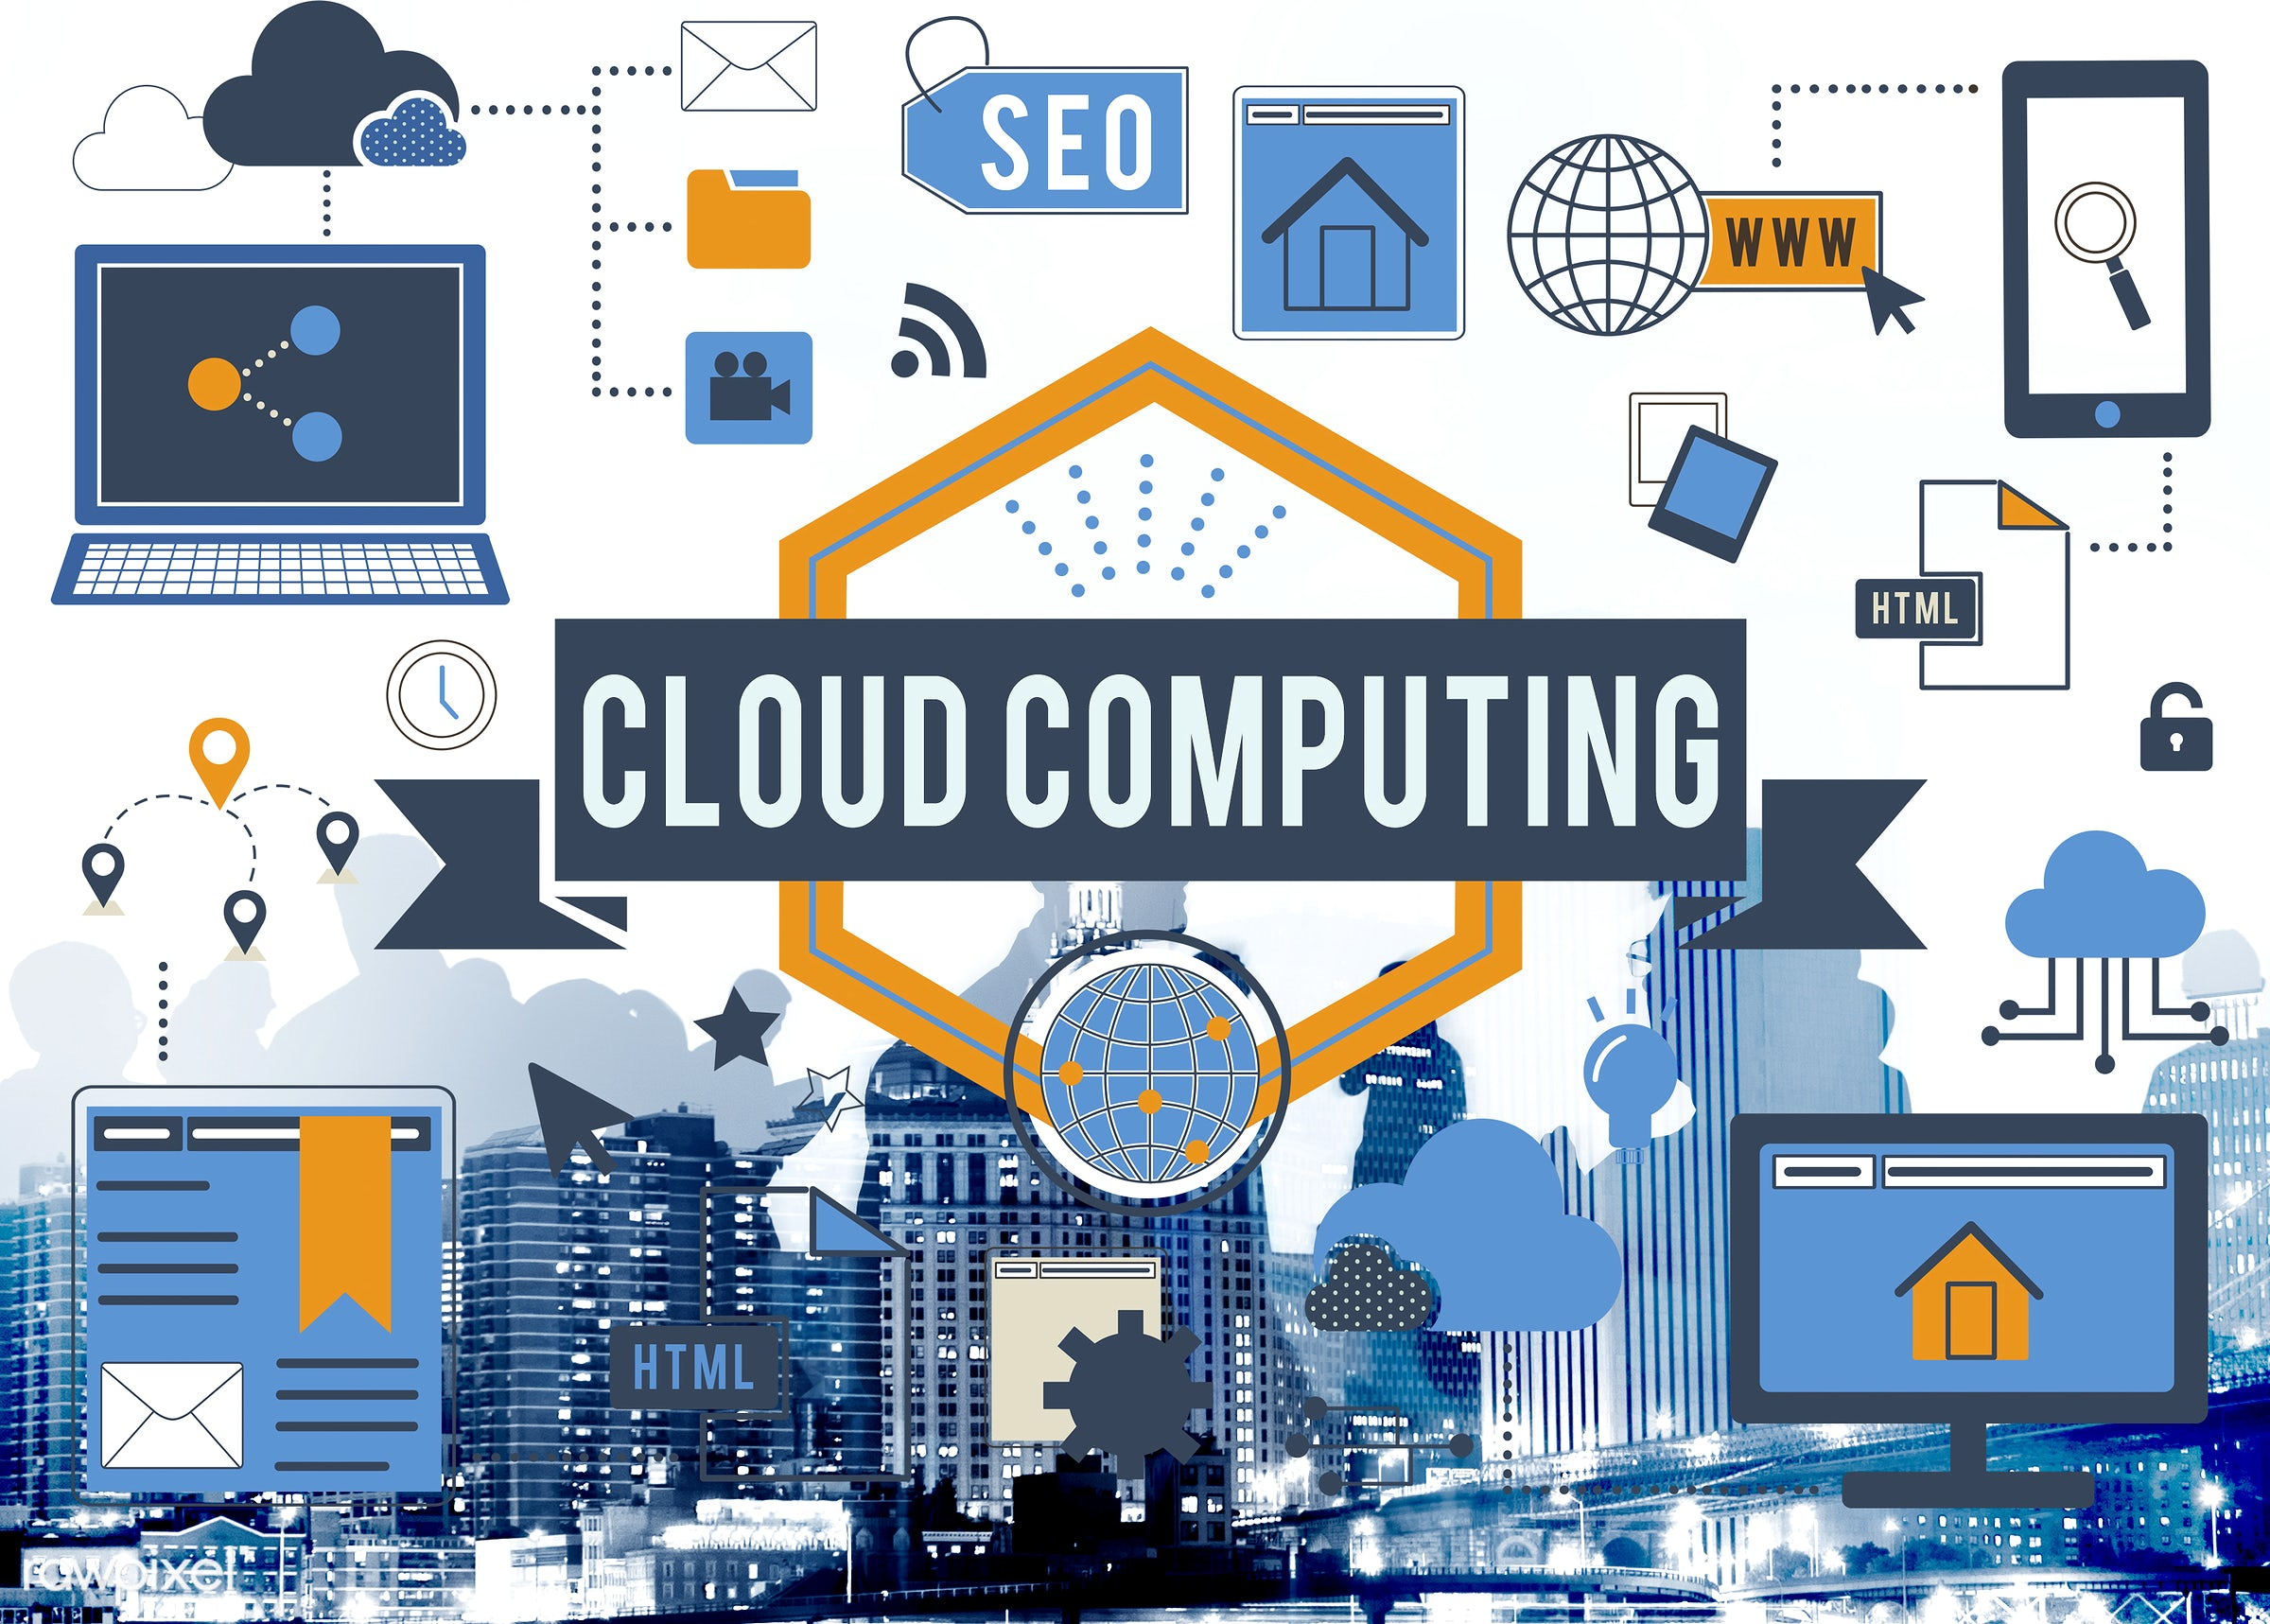 cloud, cloud computing, networking, digital, abstract, back lit, brainstorming, building, business, businessmen,...